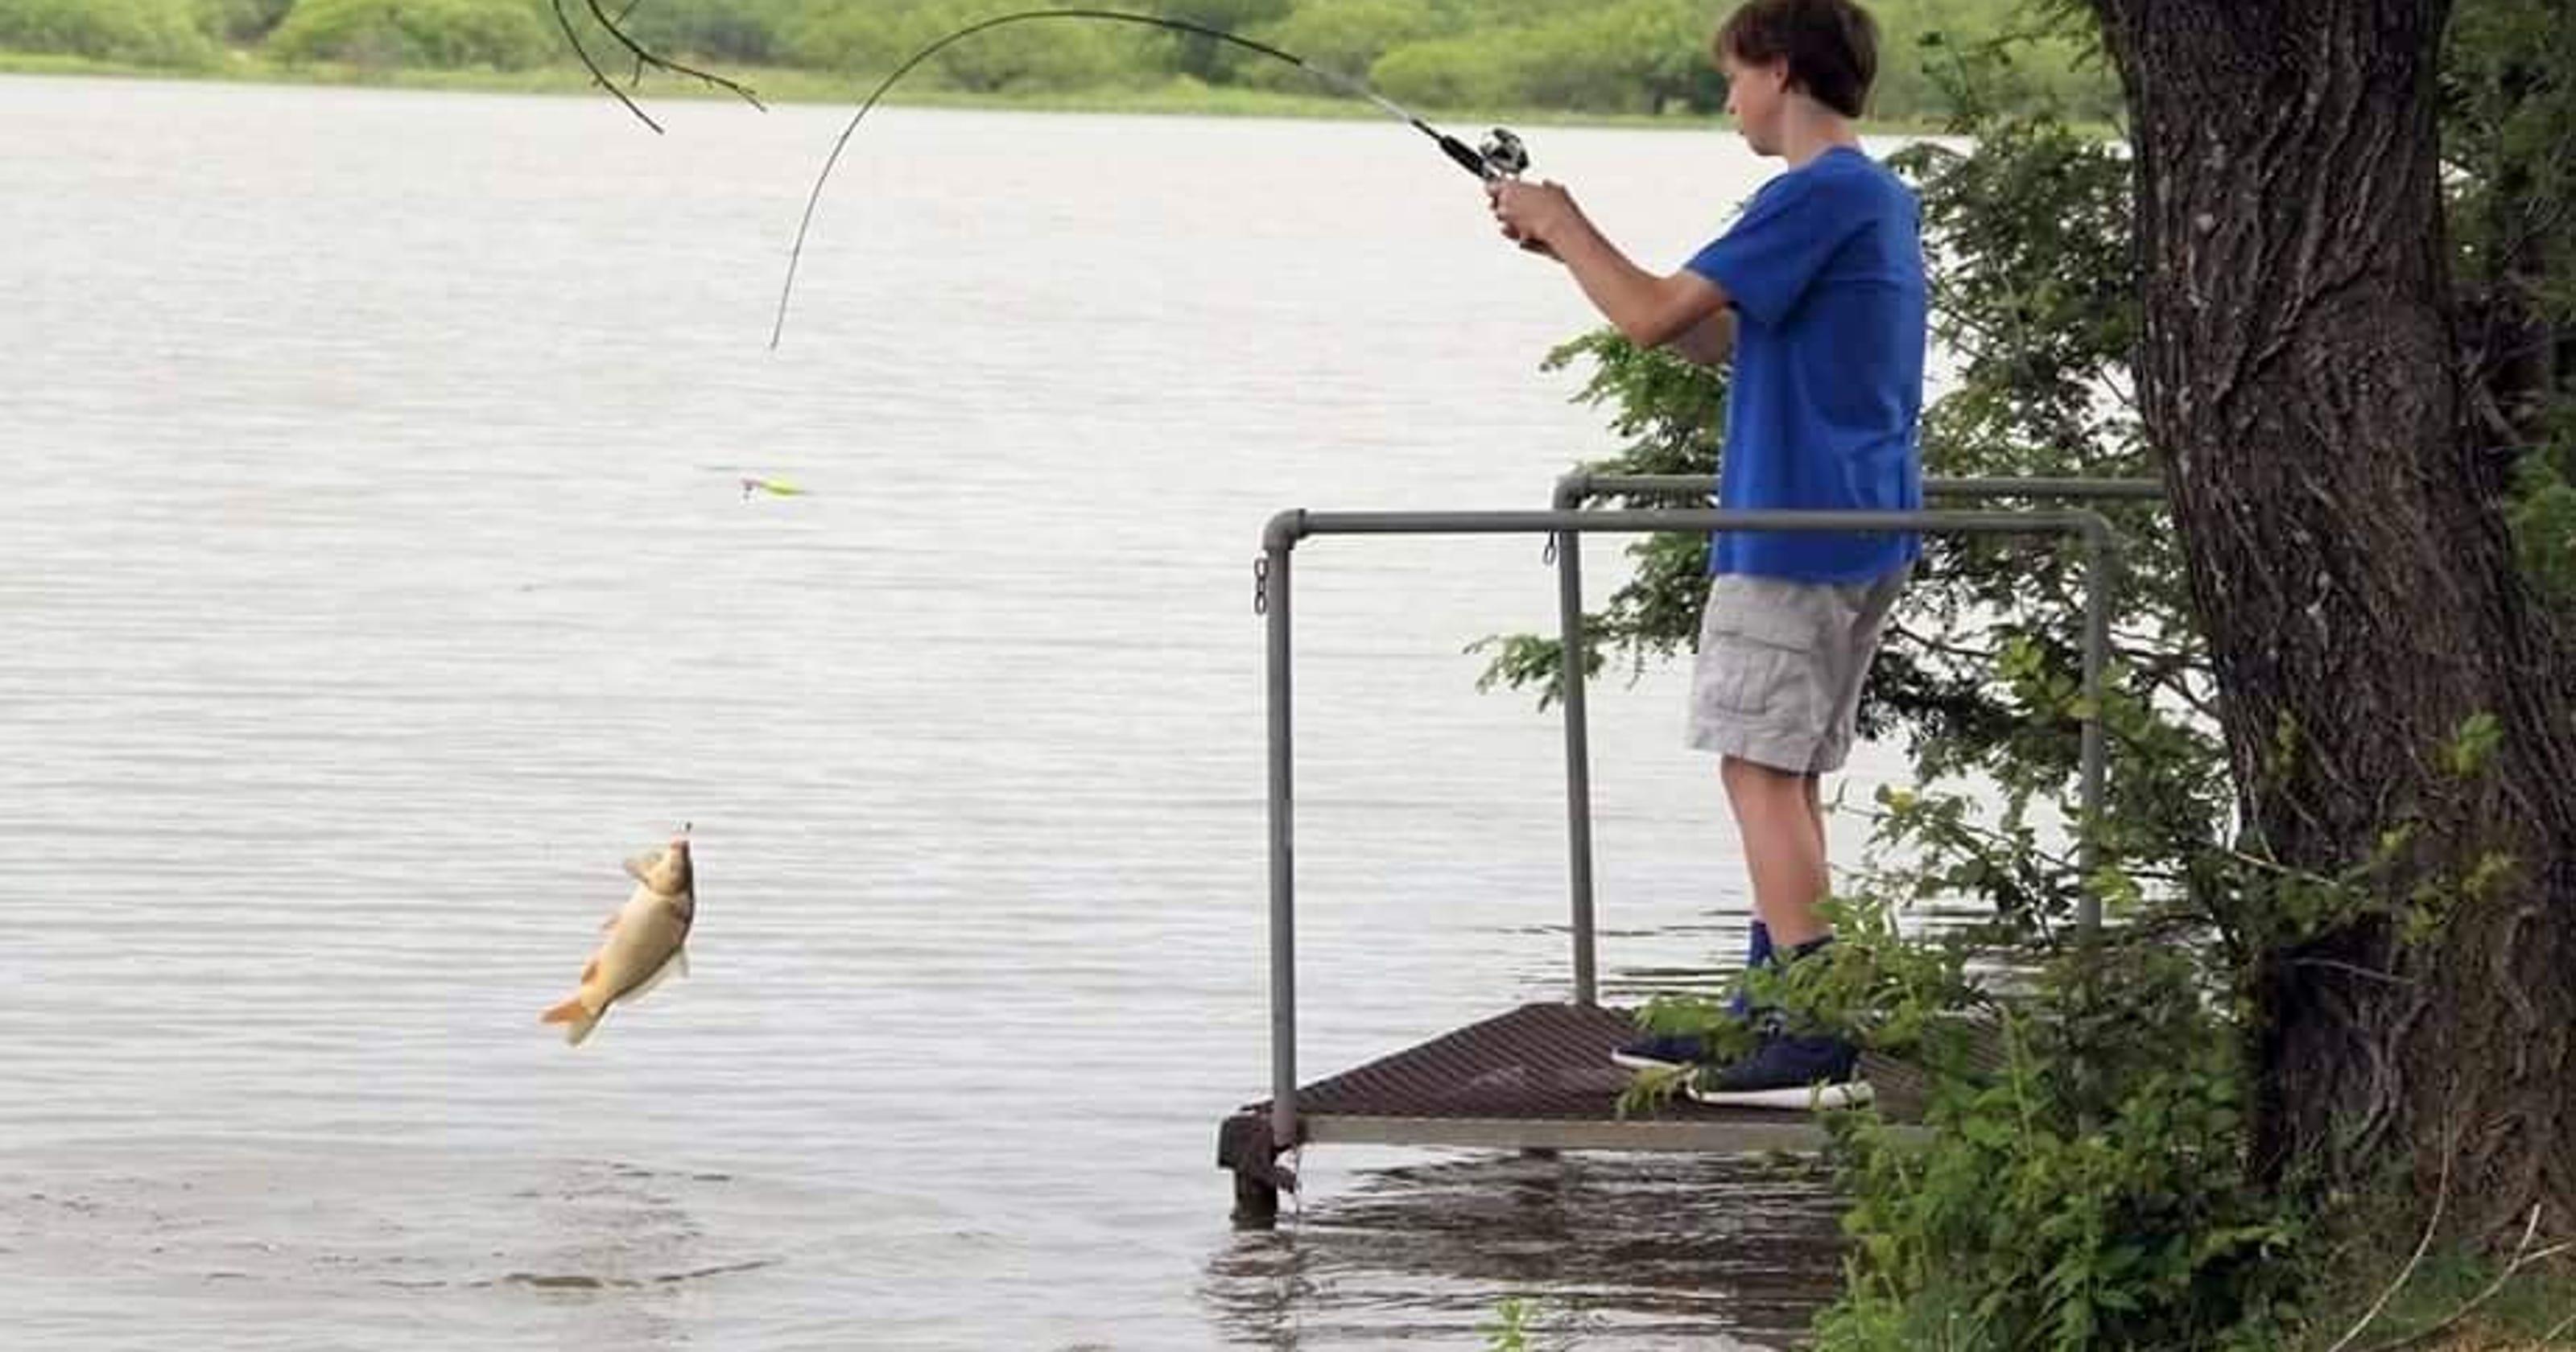 New Texas fishing regulations affect Possum Kingdom